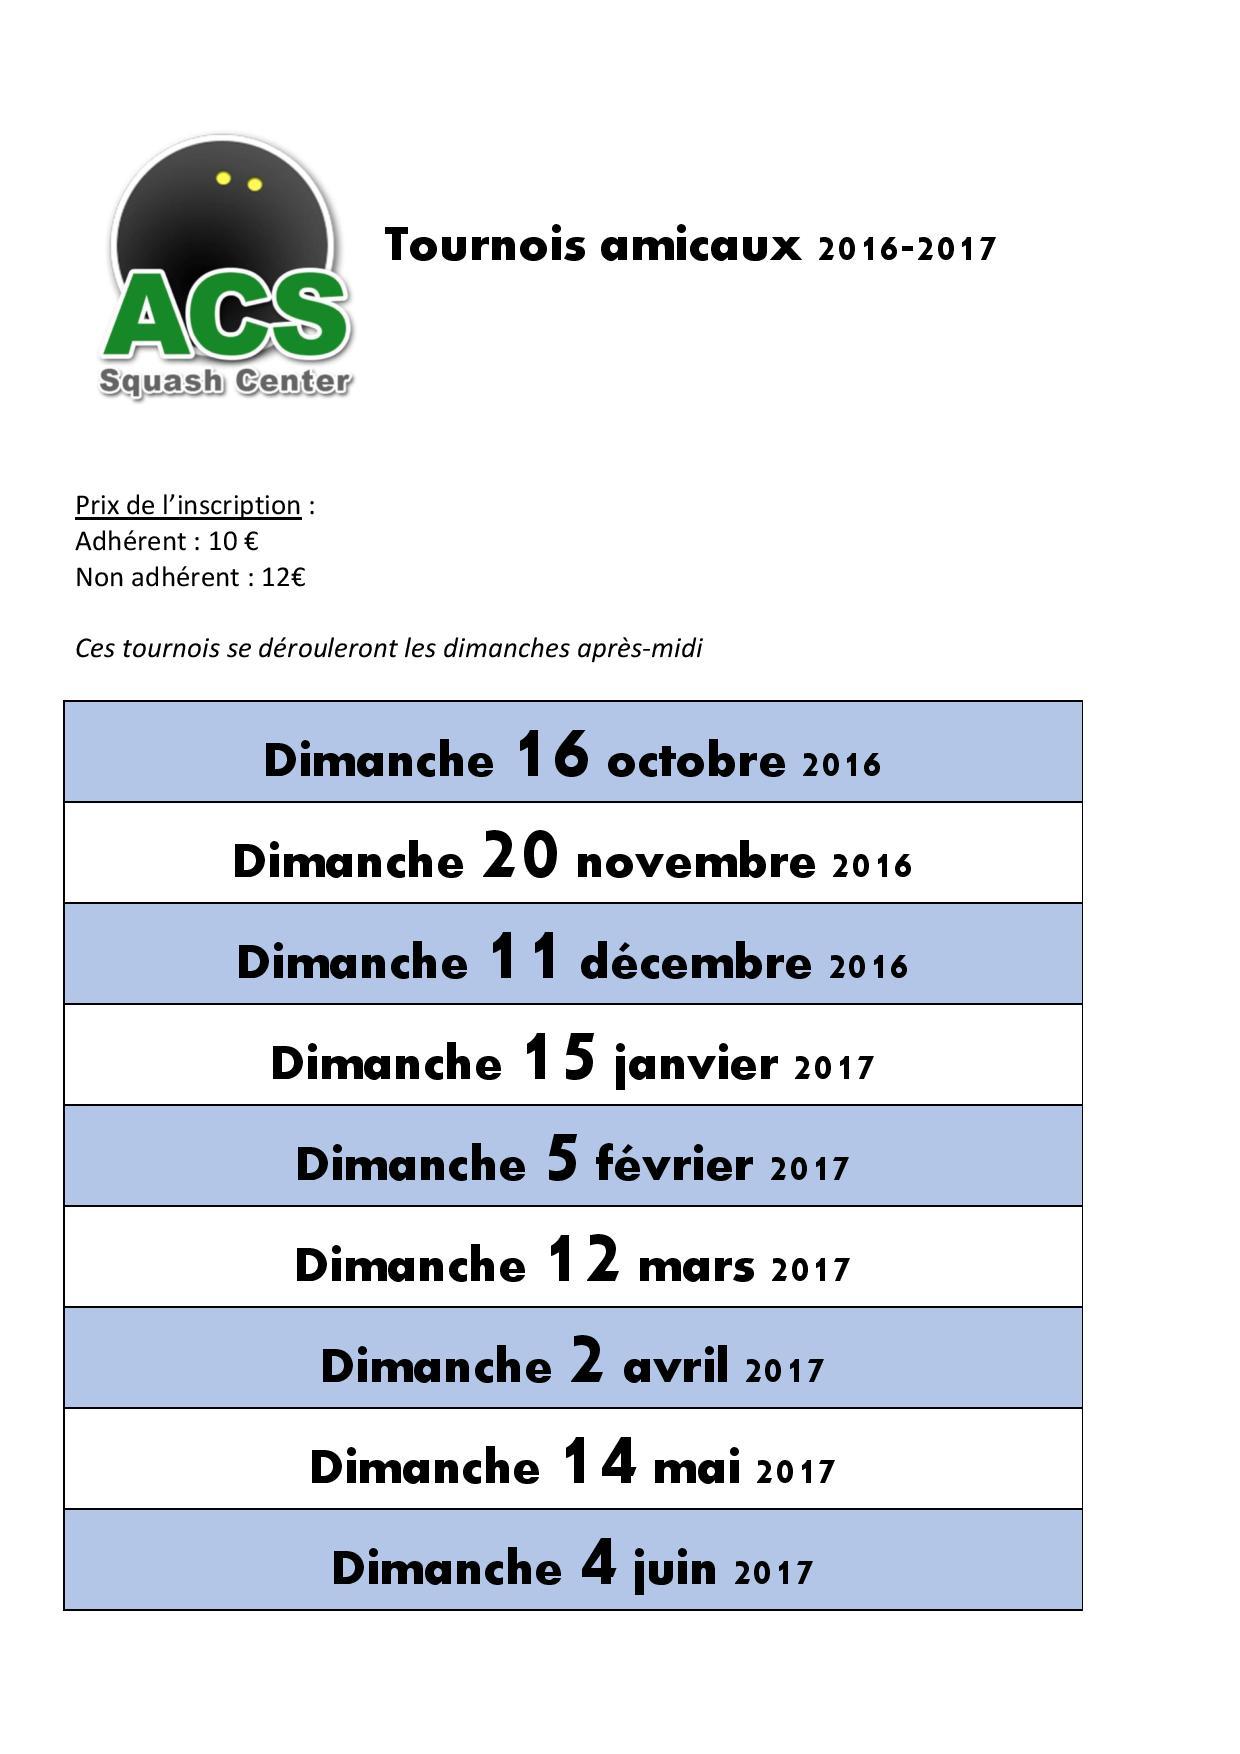 tournois_amicaux_2016_2017-page-001